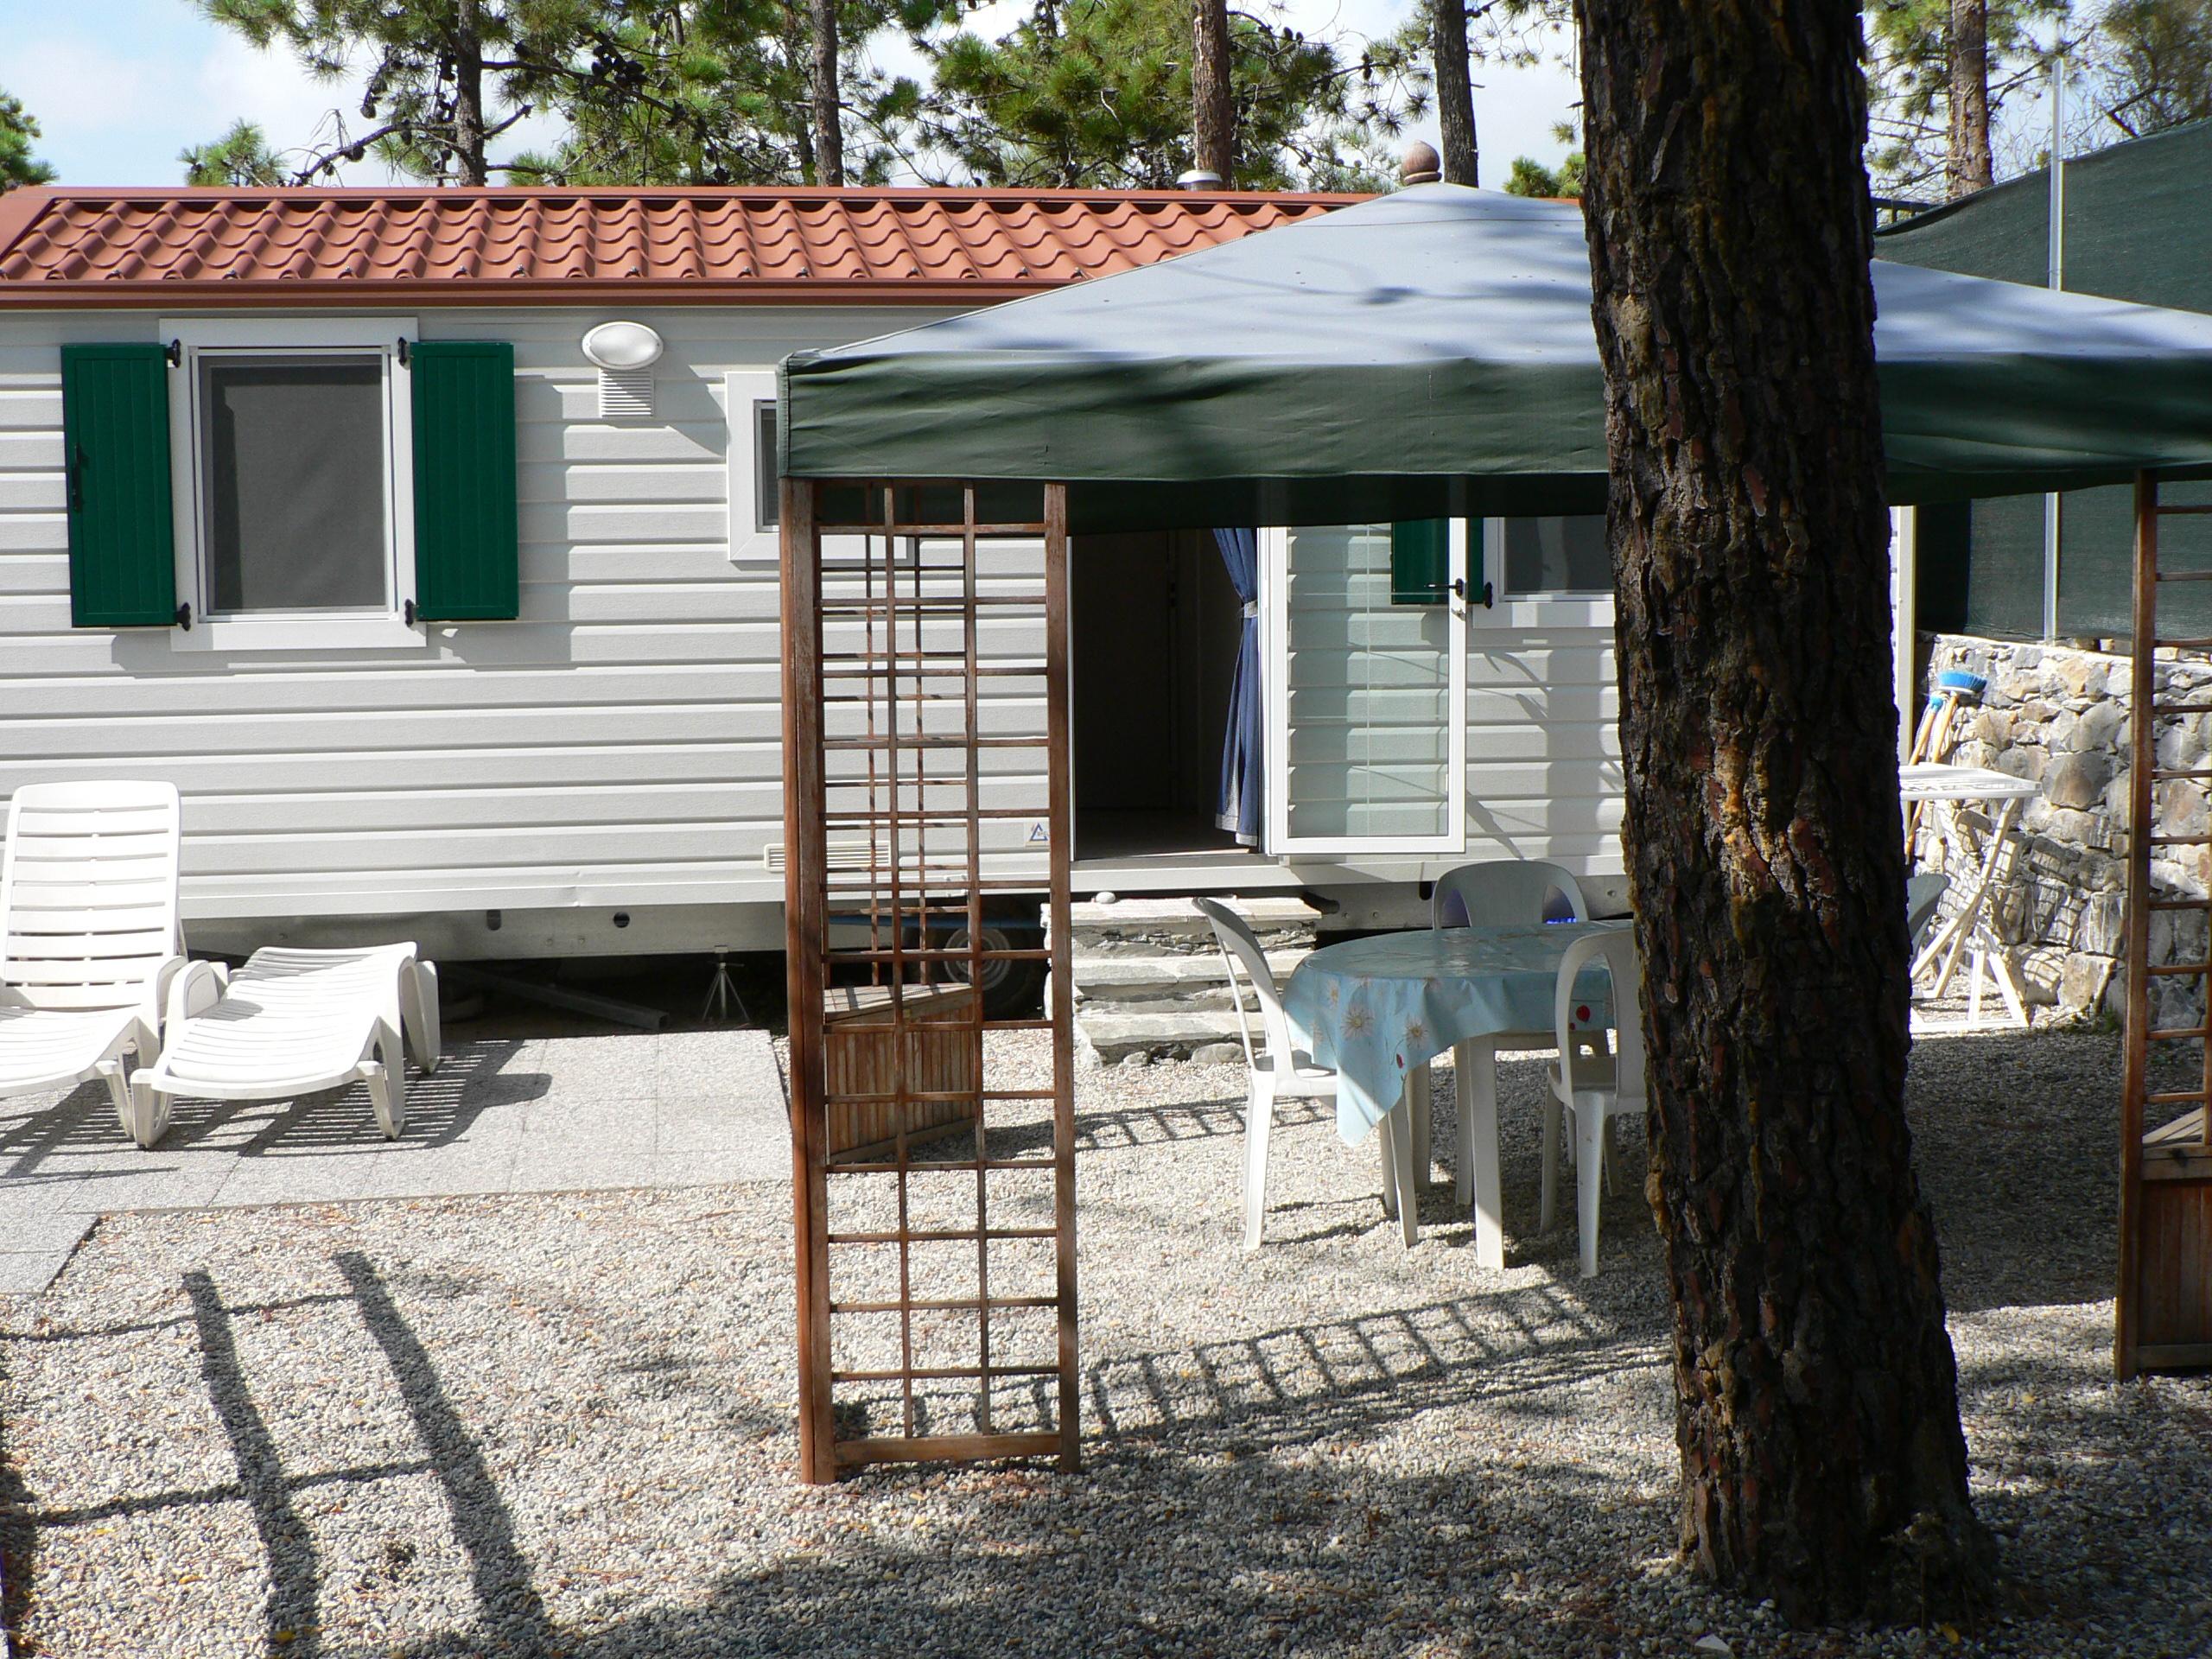 Casa Mobile - Vista esterna